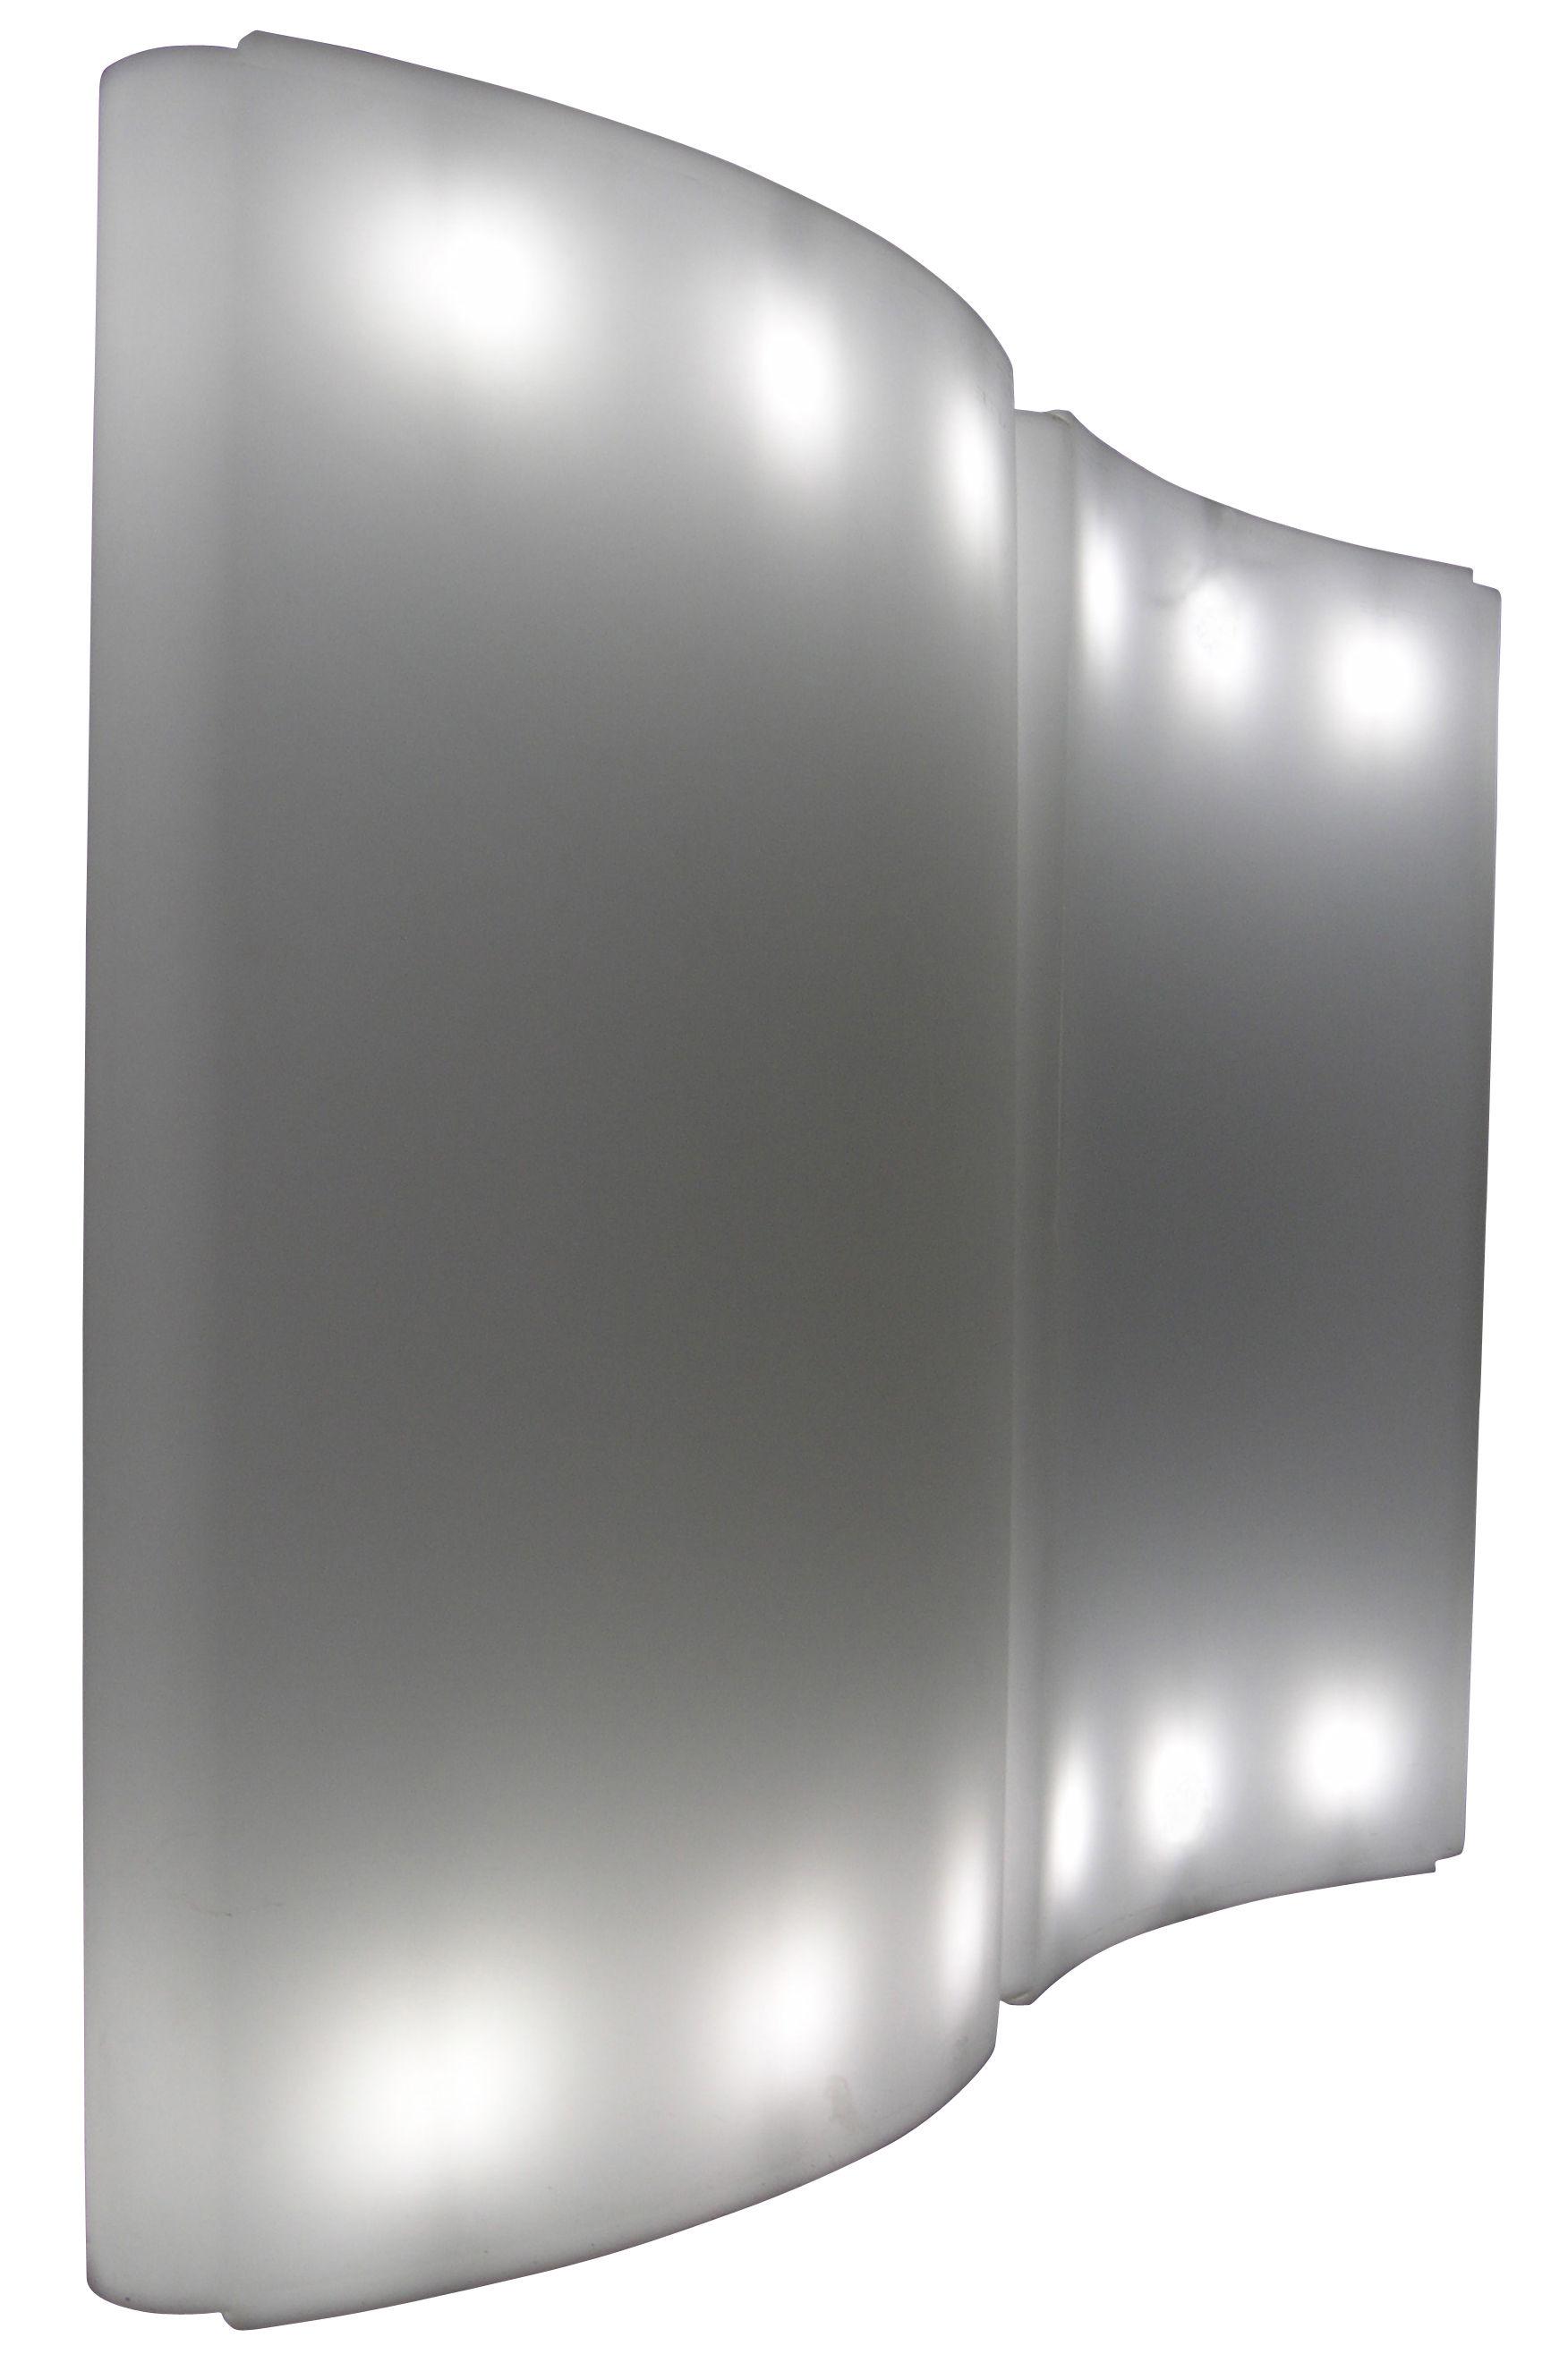 Möbel - Leuchtmöbel - Gio Wind beleuchteter Paravant - Slide - Weiß - recycelbares Polyethen